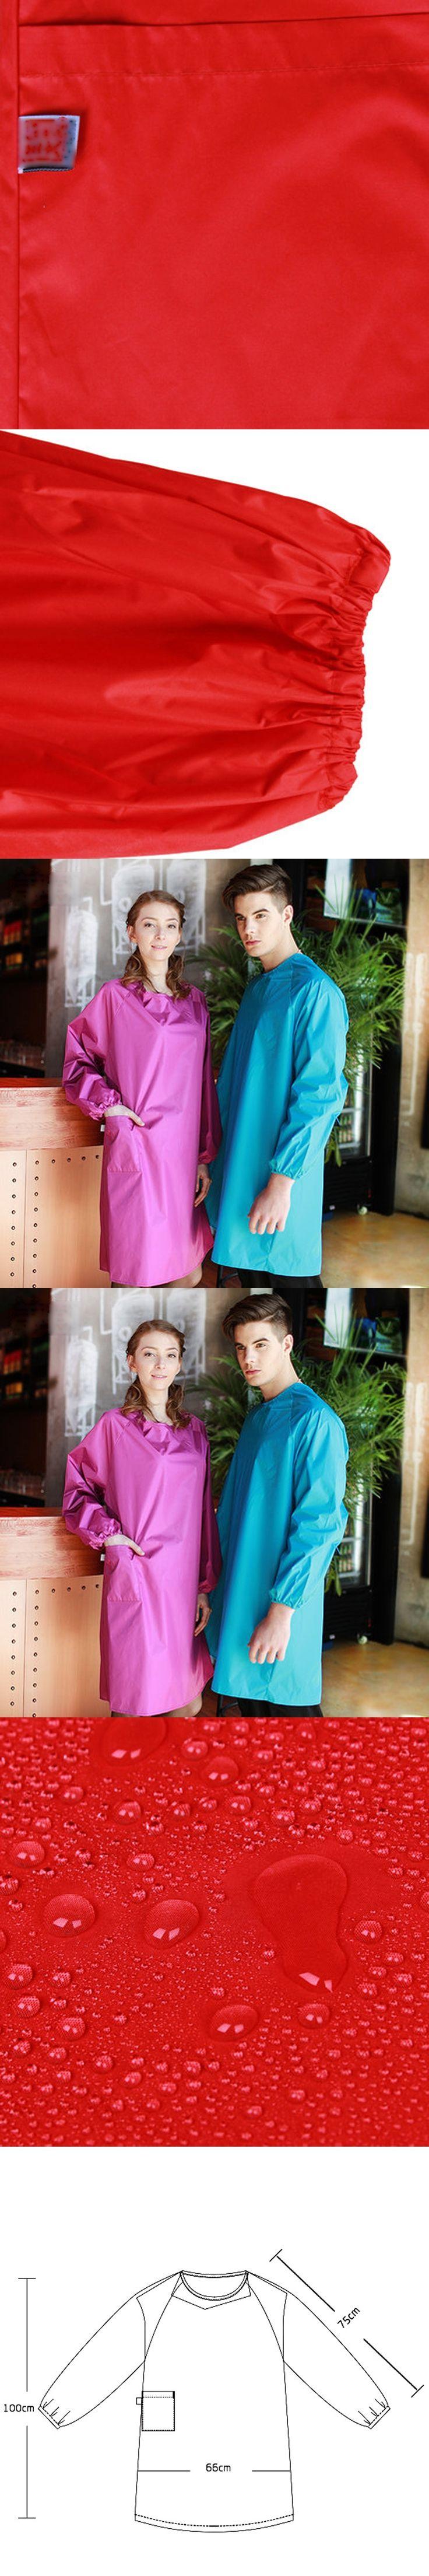 High Quality Korean Long Sleeve Waterproof Aprons Kitchen Cooking Chef Apron For Men Women Fashion Ren Blue PVC Apron